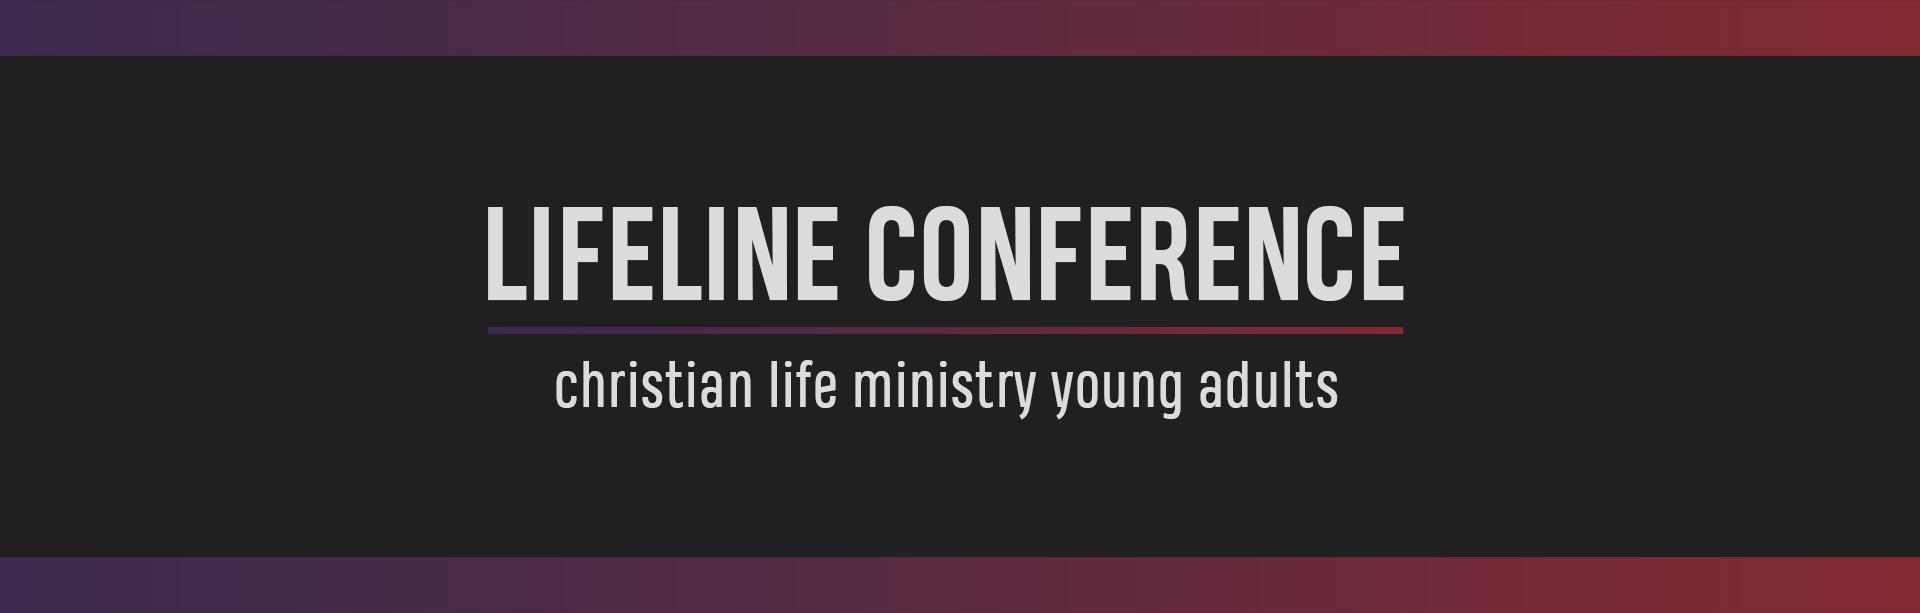 Lifeline Conference